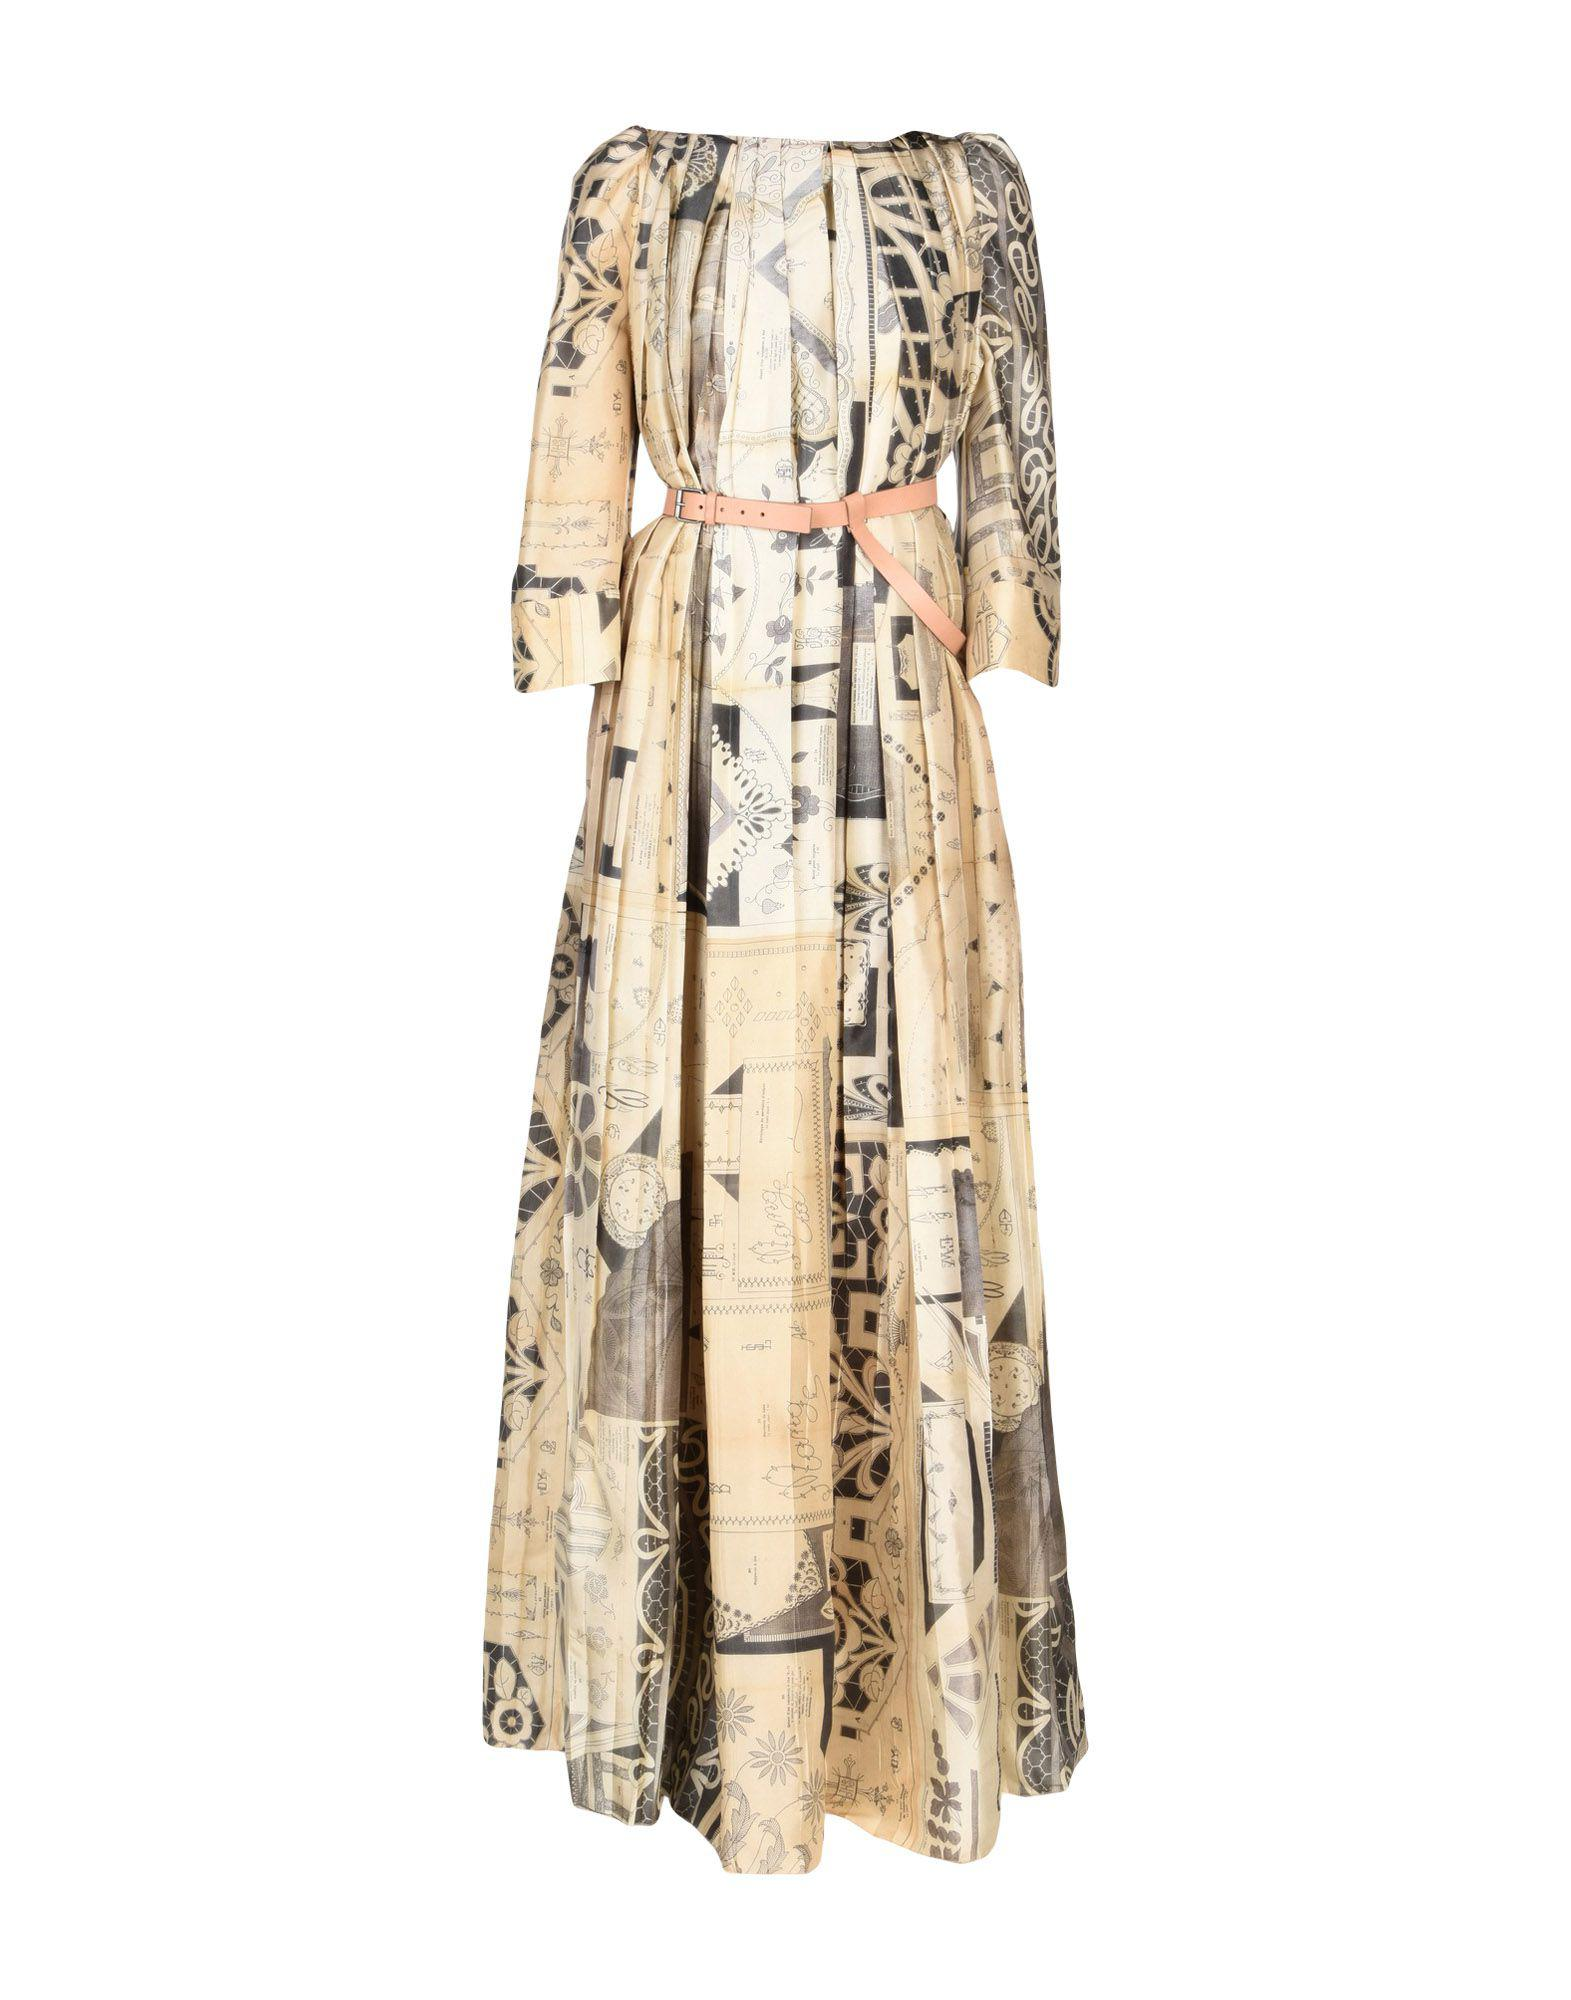 8811c86909 Lyst - Maison Margiela Long Dress in Natural